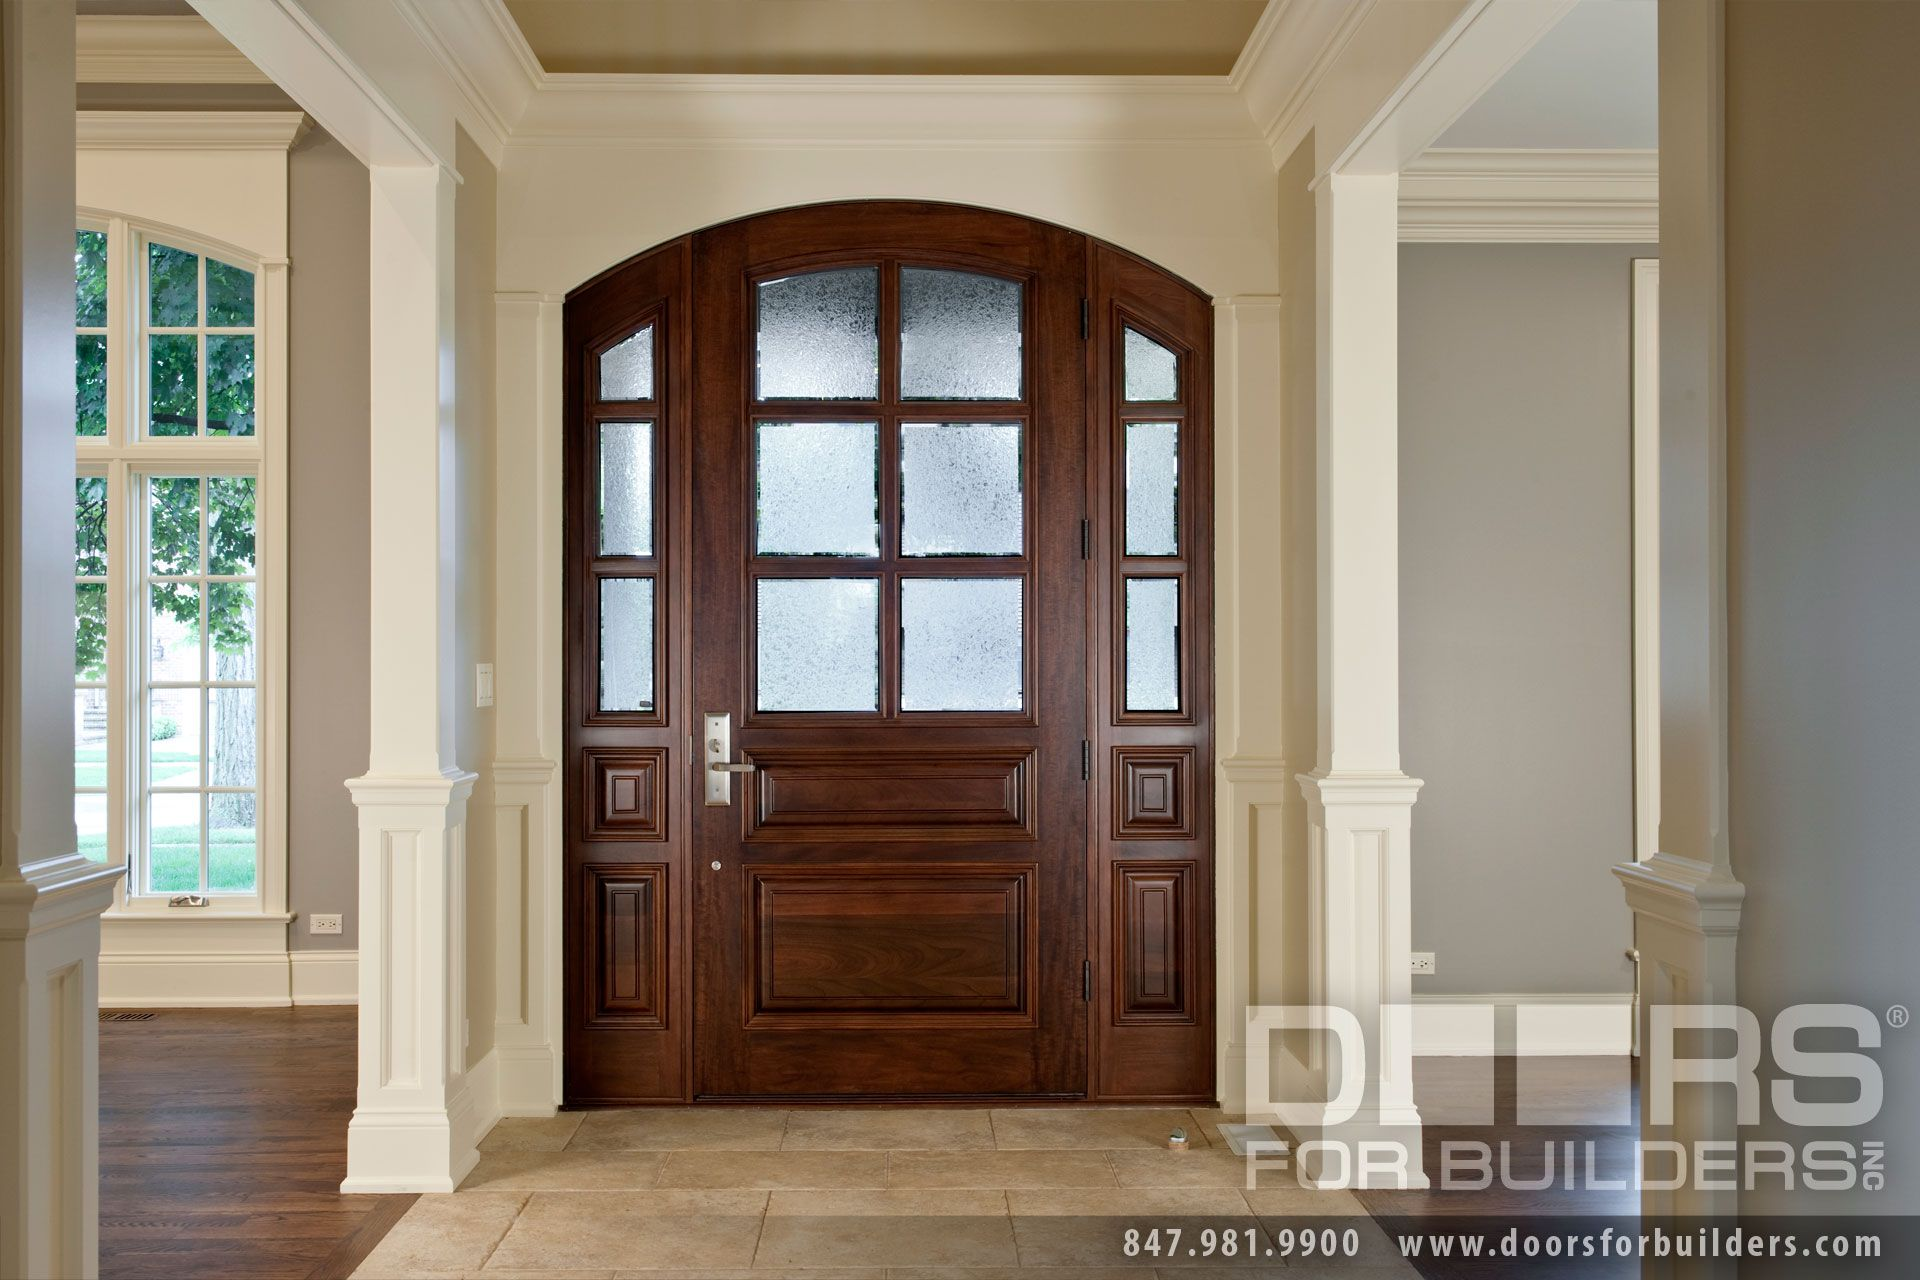 Wood Front Entry Doors in Stock